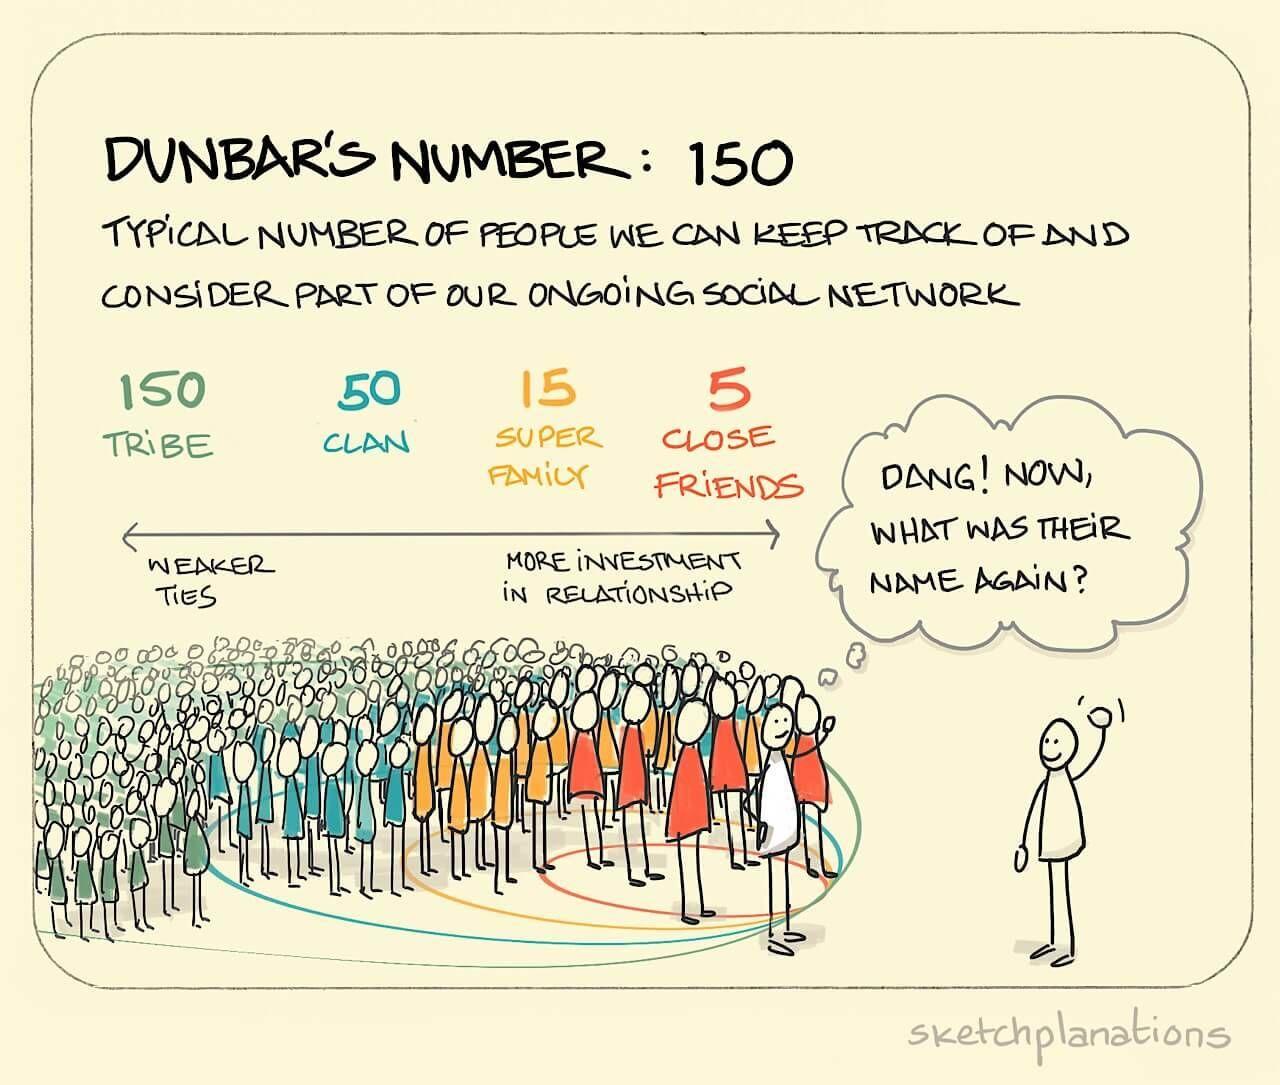 Can We Break Dunbar's Number?